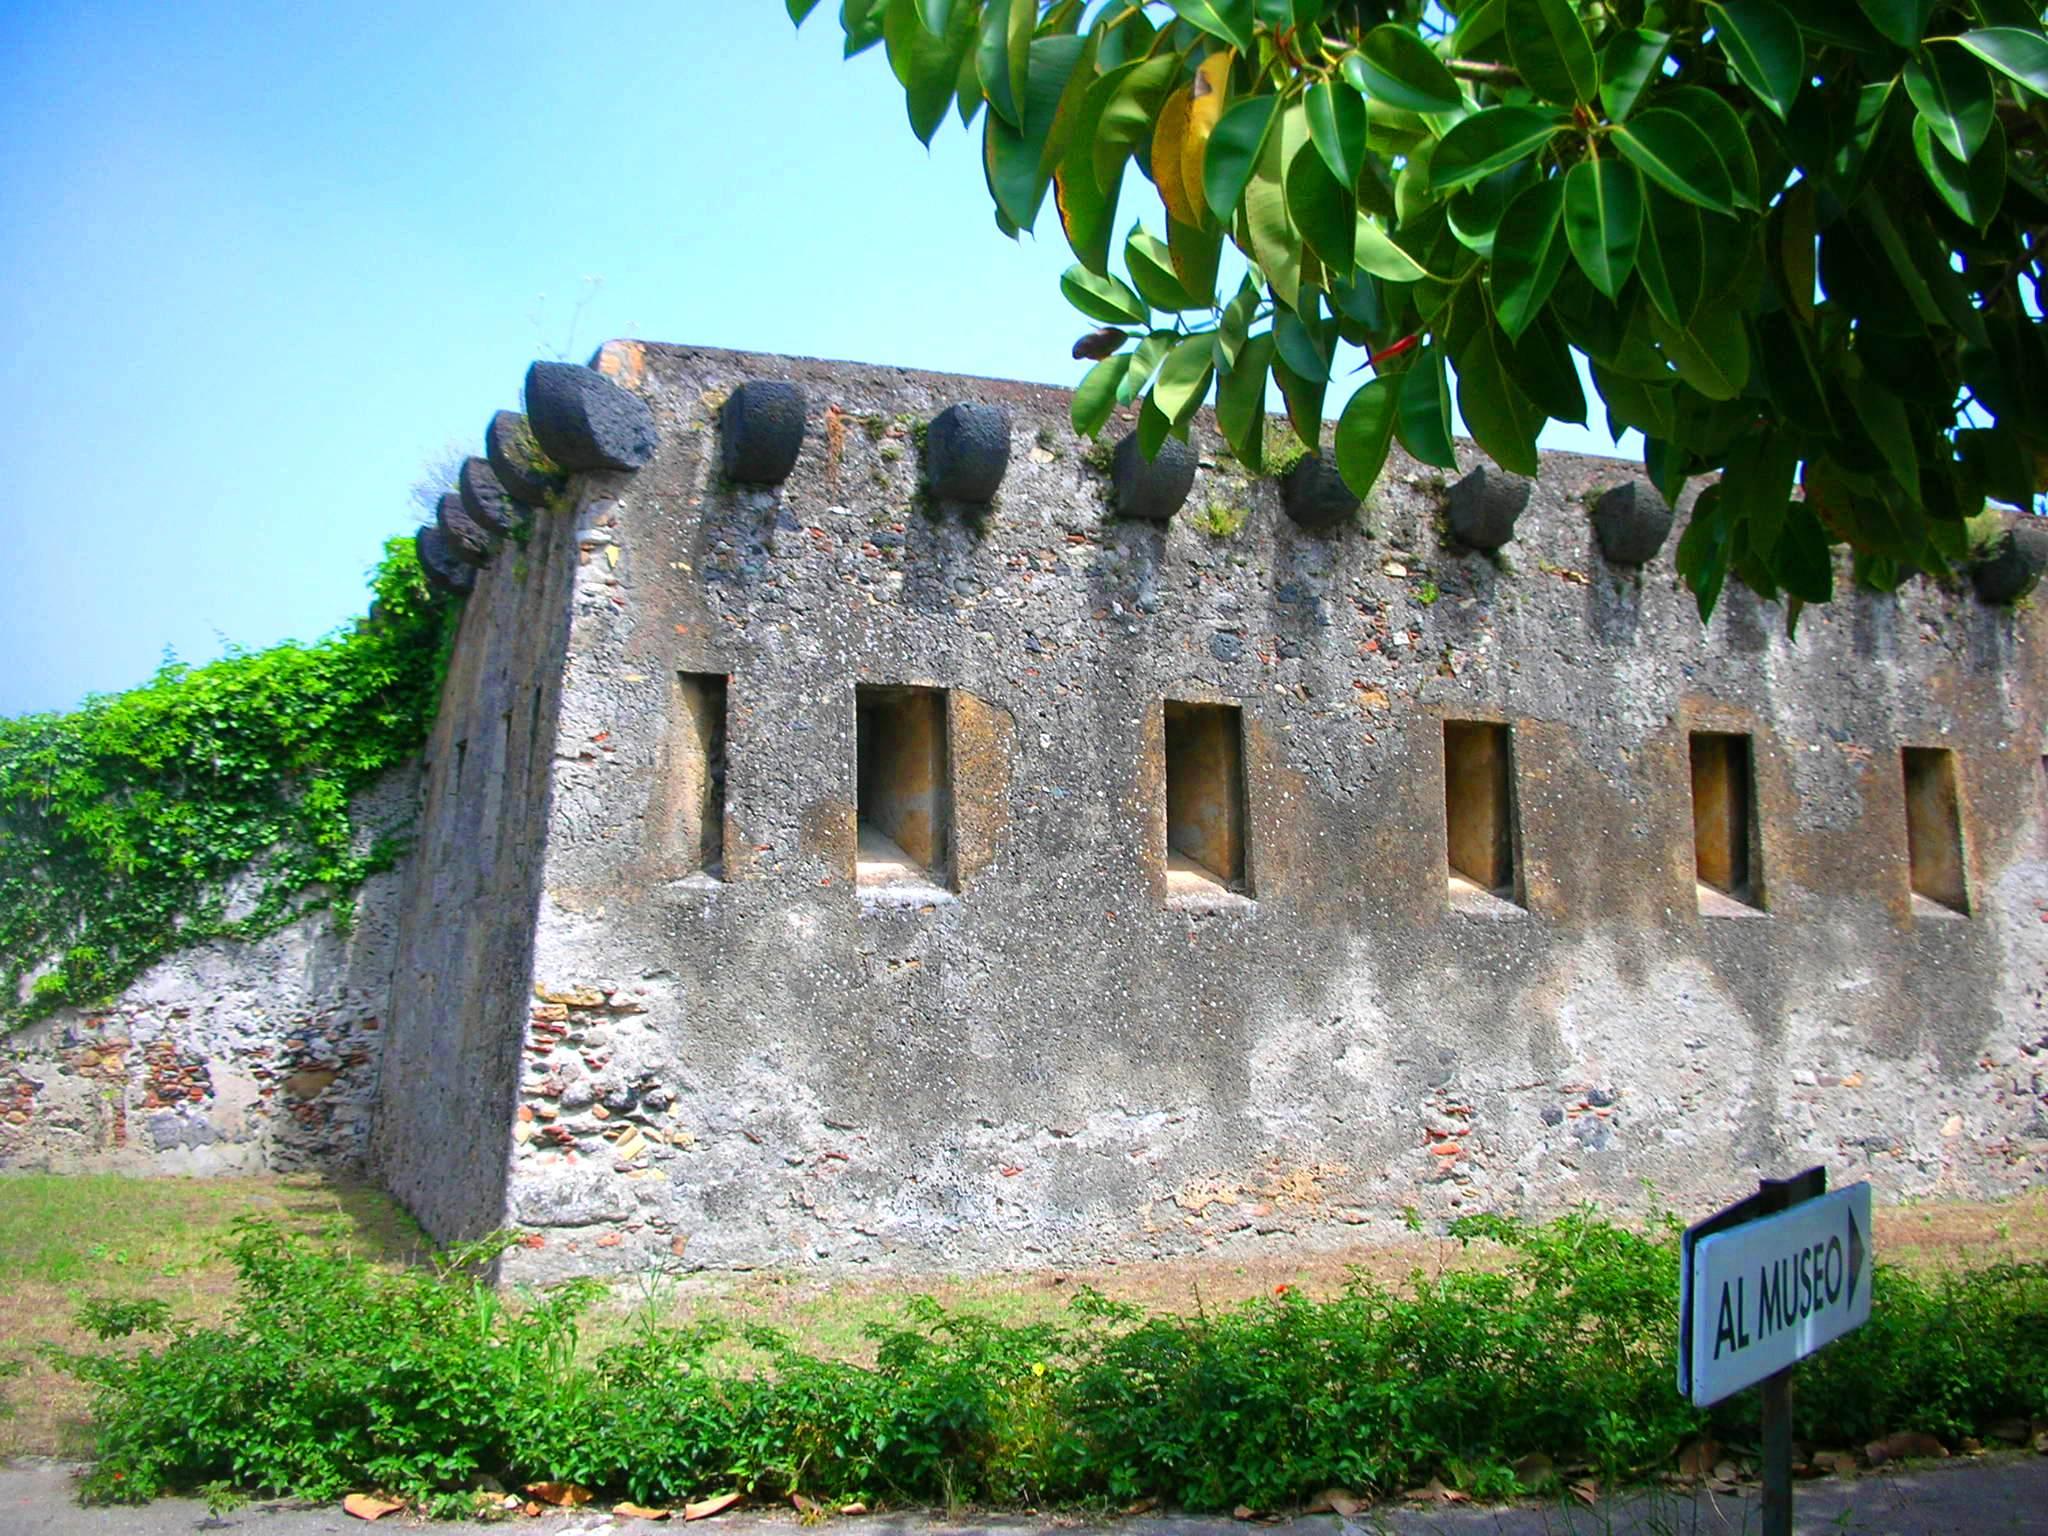 Parco archeologico naxos hotel palladio - Hotel palladio giardini naxos ...